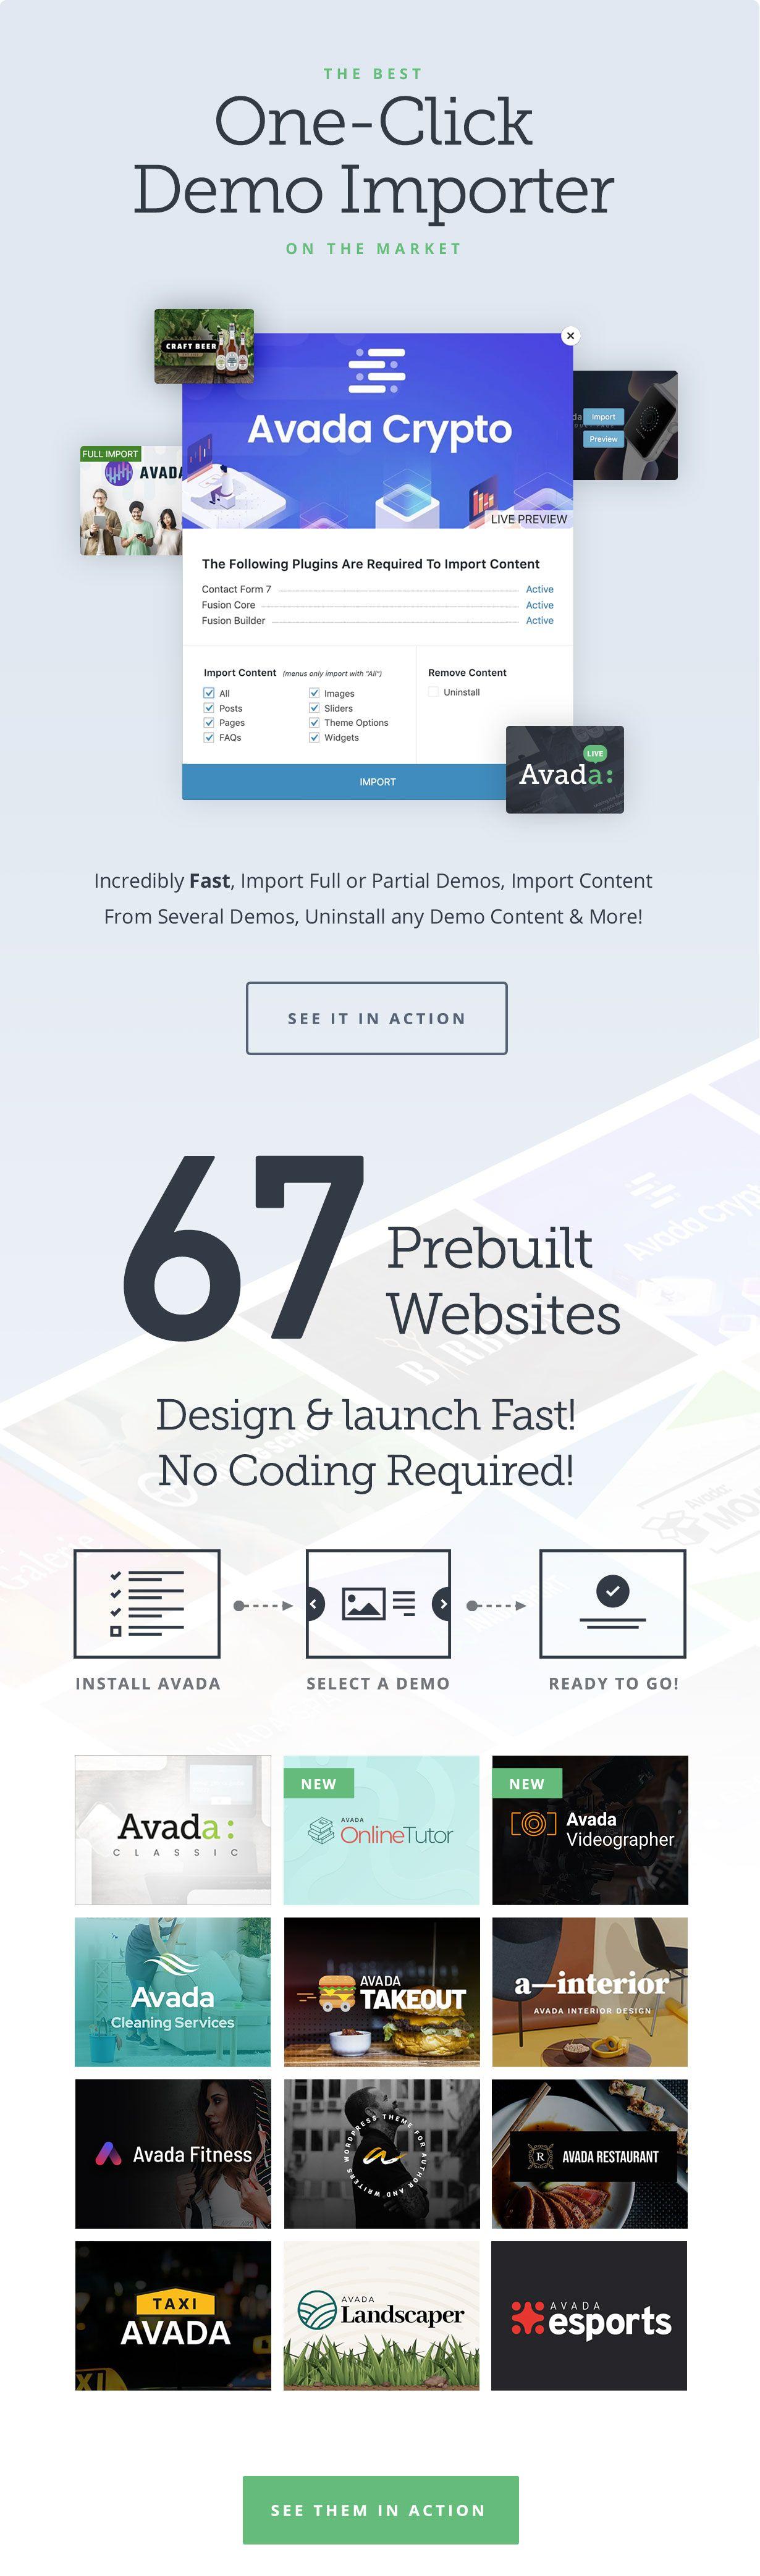 demoimporter itempage 67demos - Avada   Website Builder For WordPress & WooCommerce